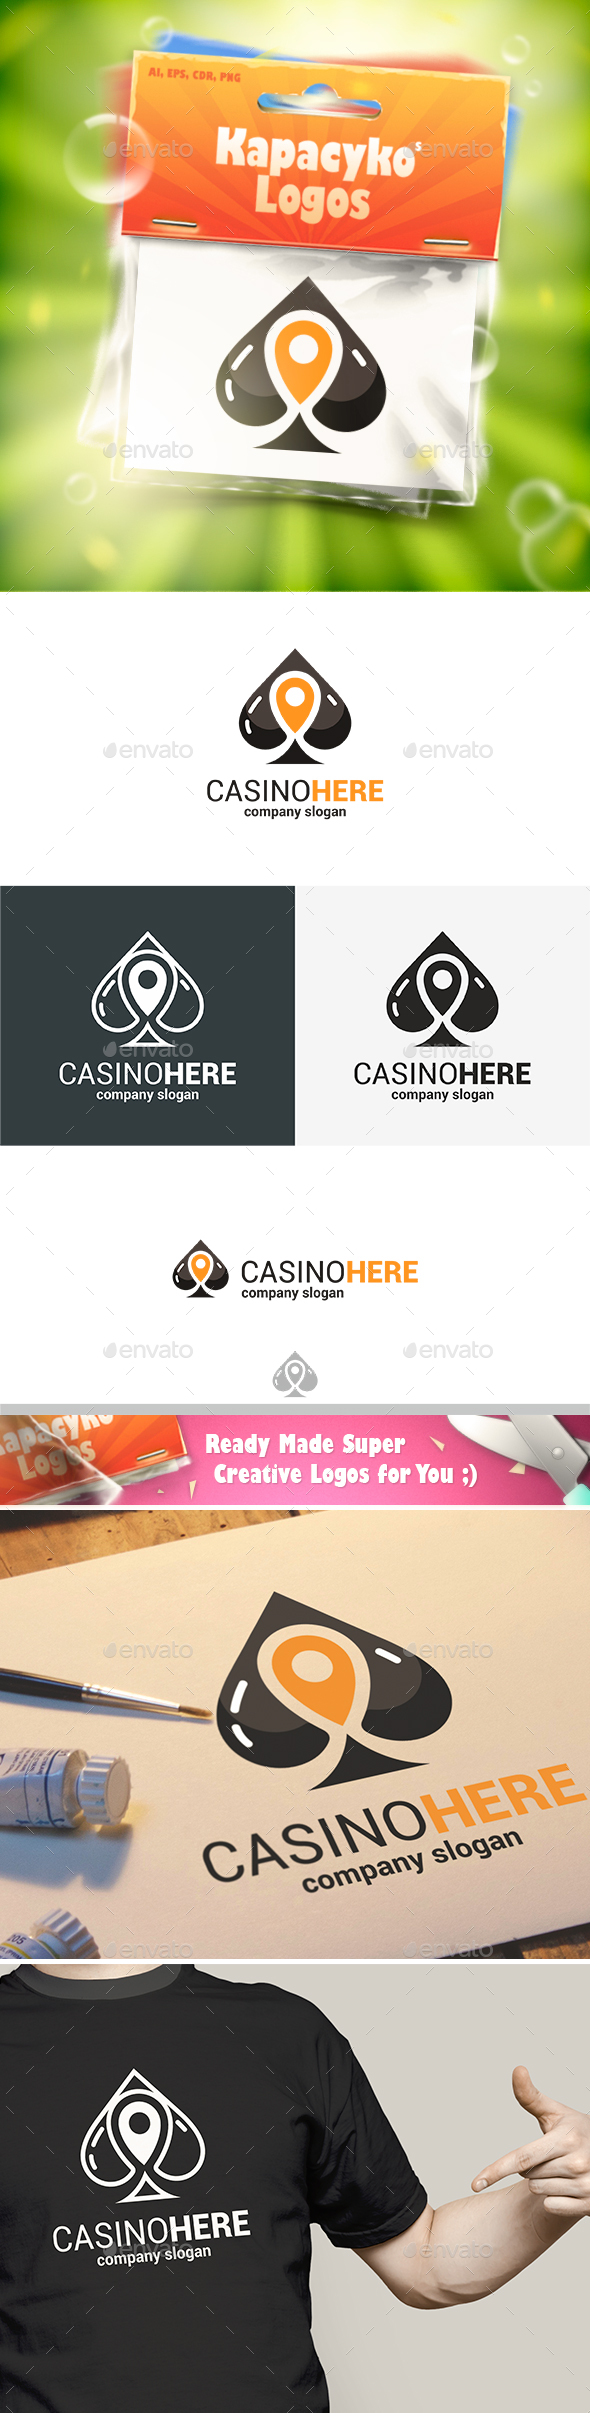 Casino Navigate Here Logo